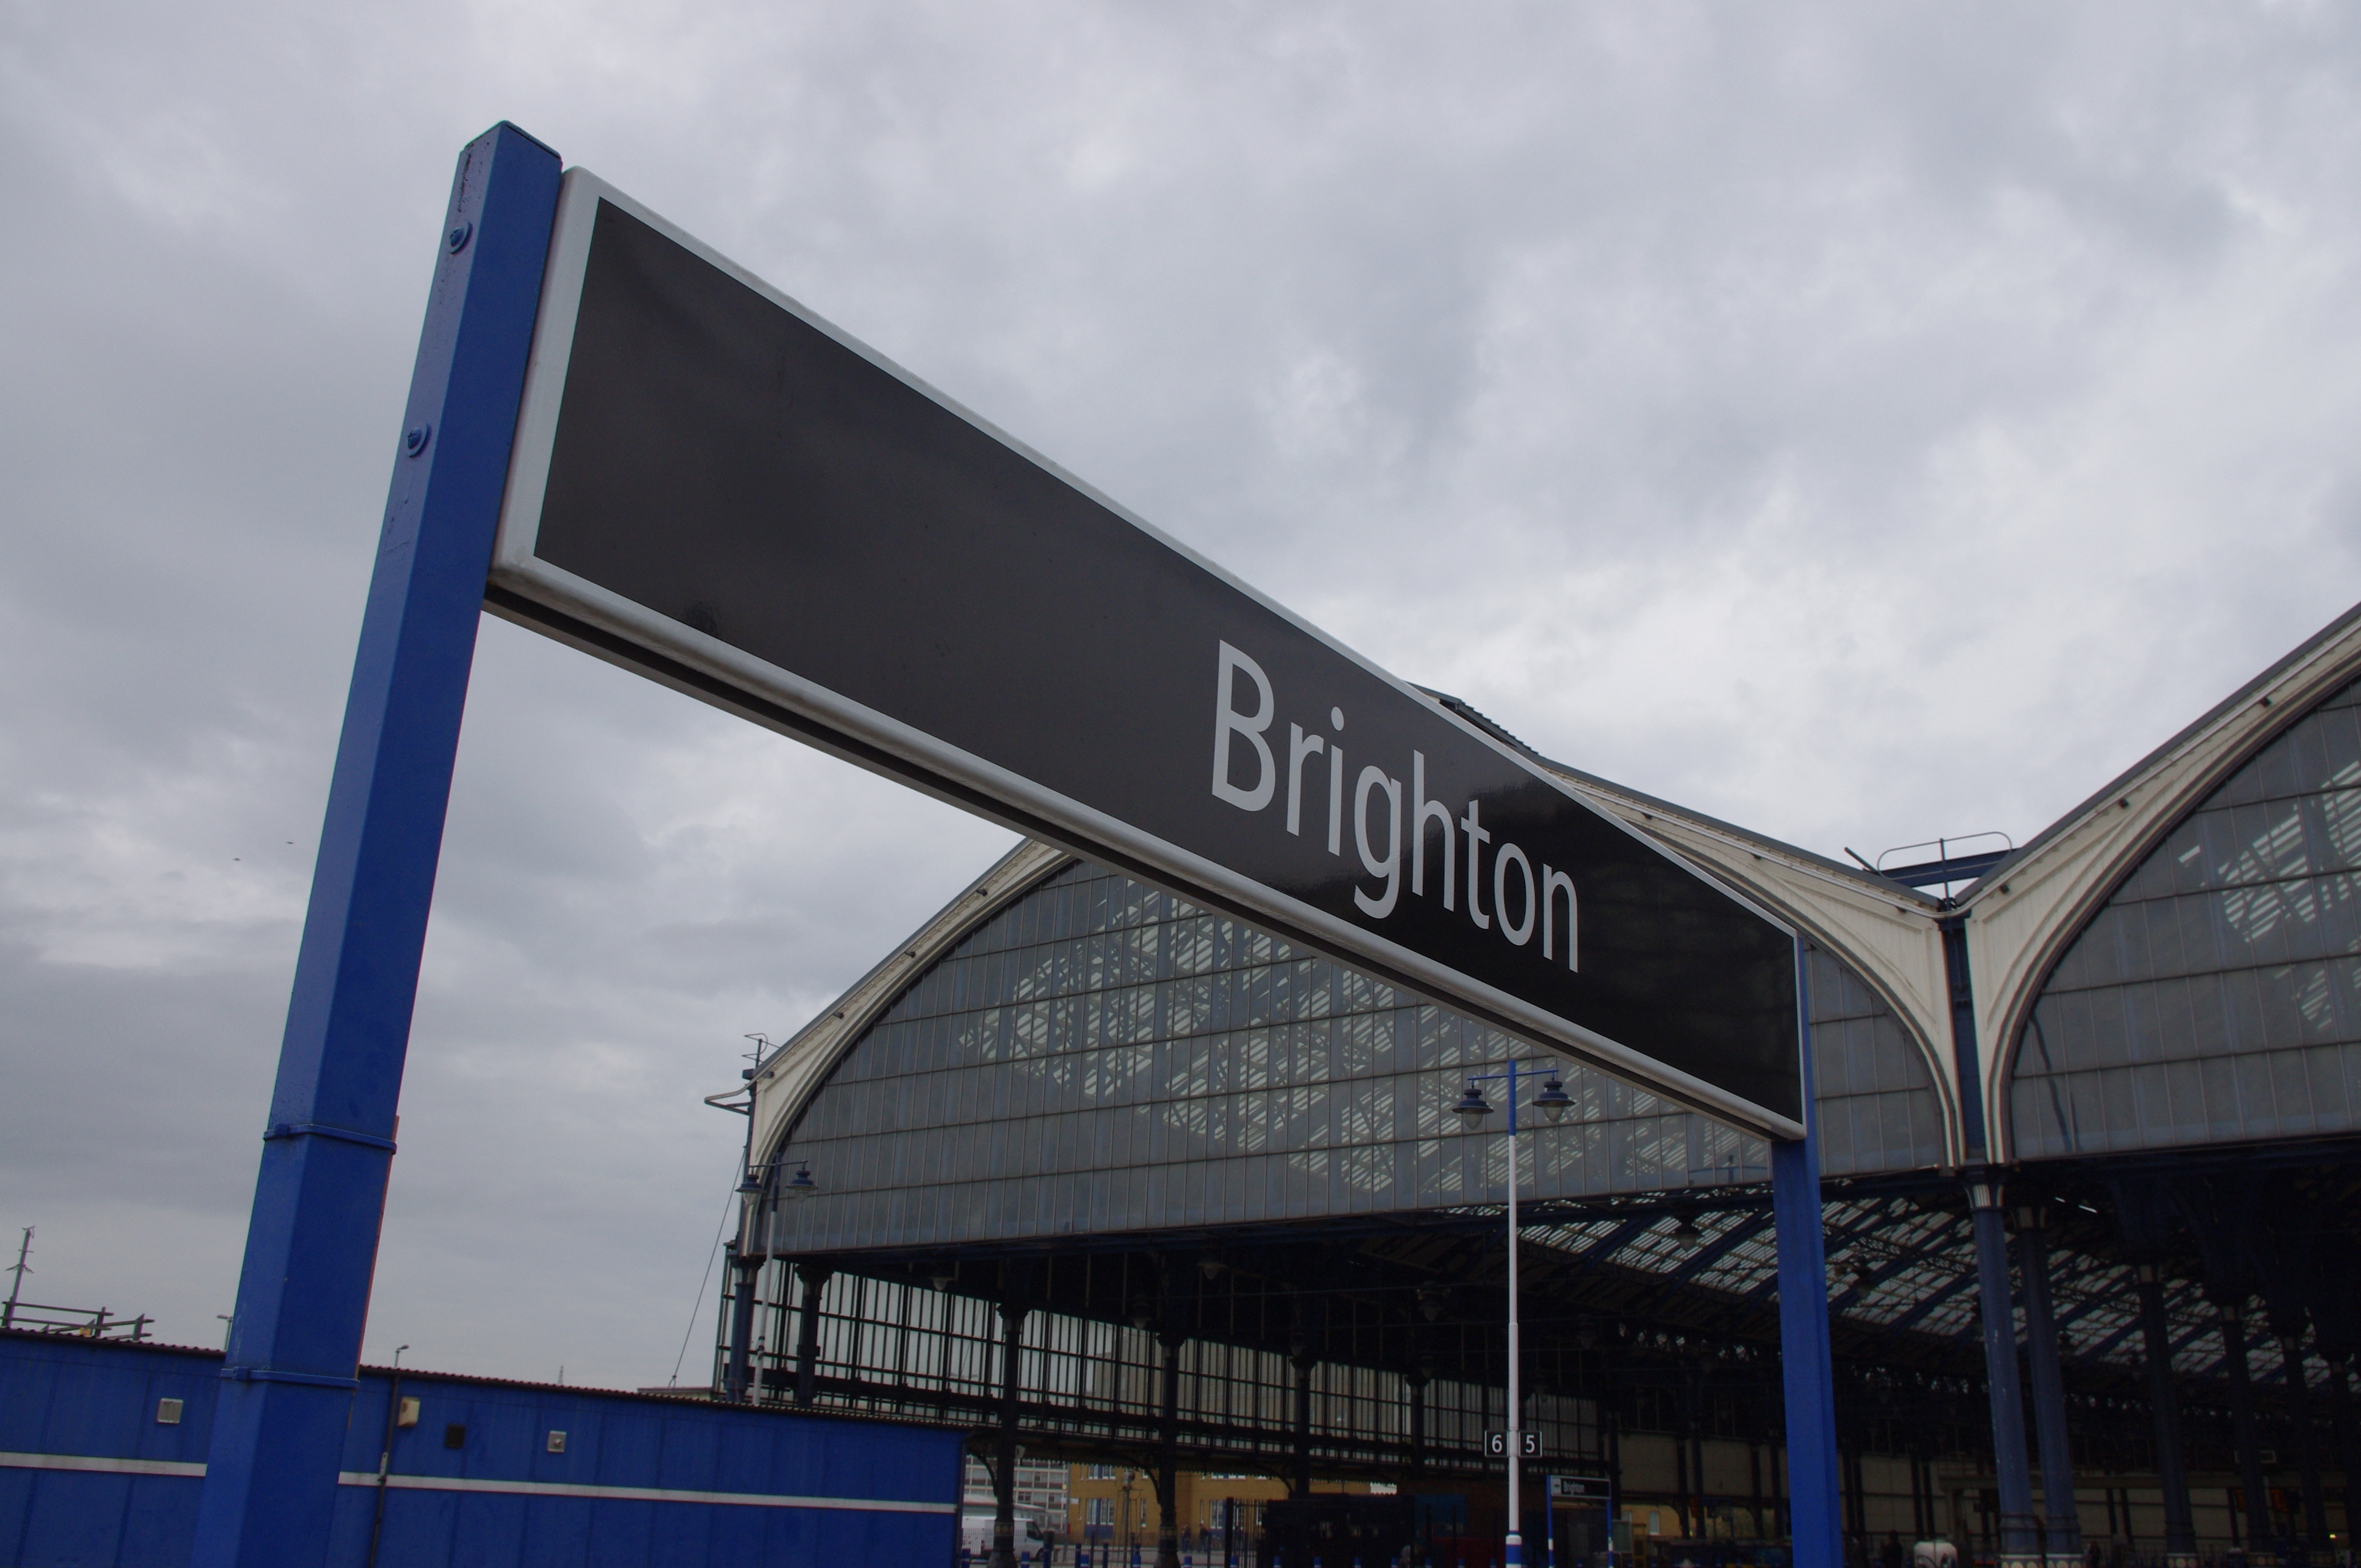 Brighton_Station_Sign